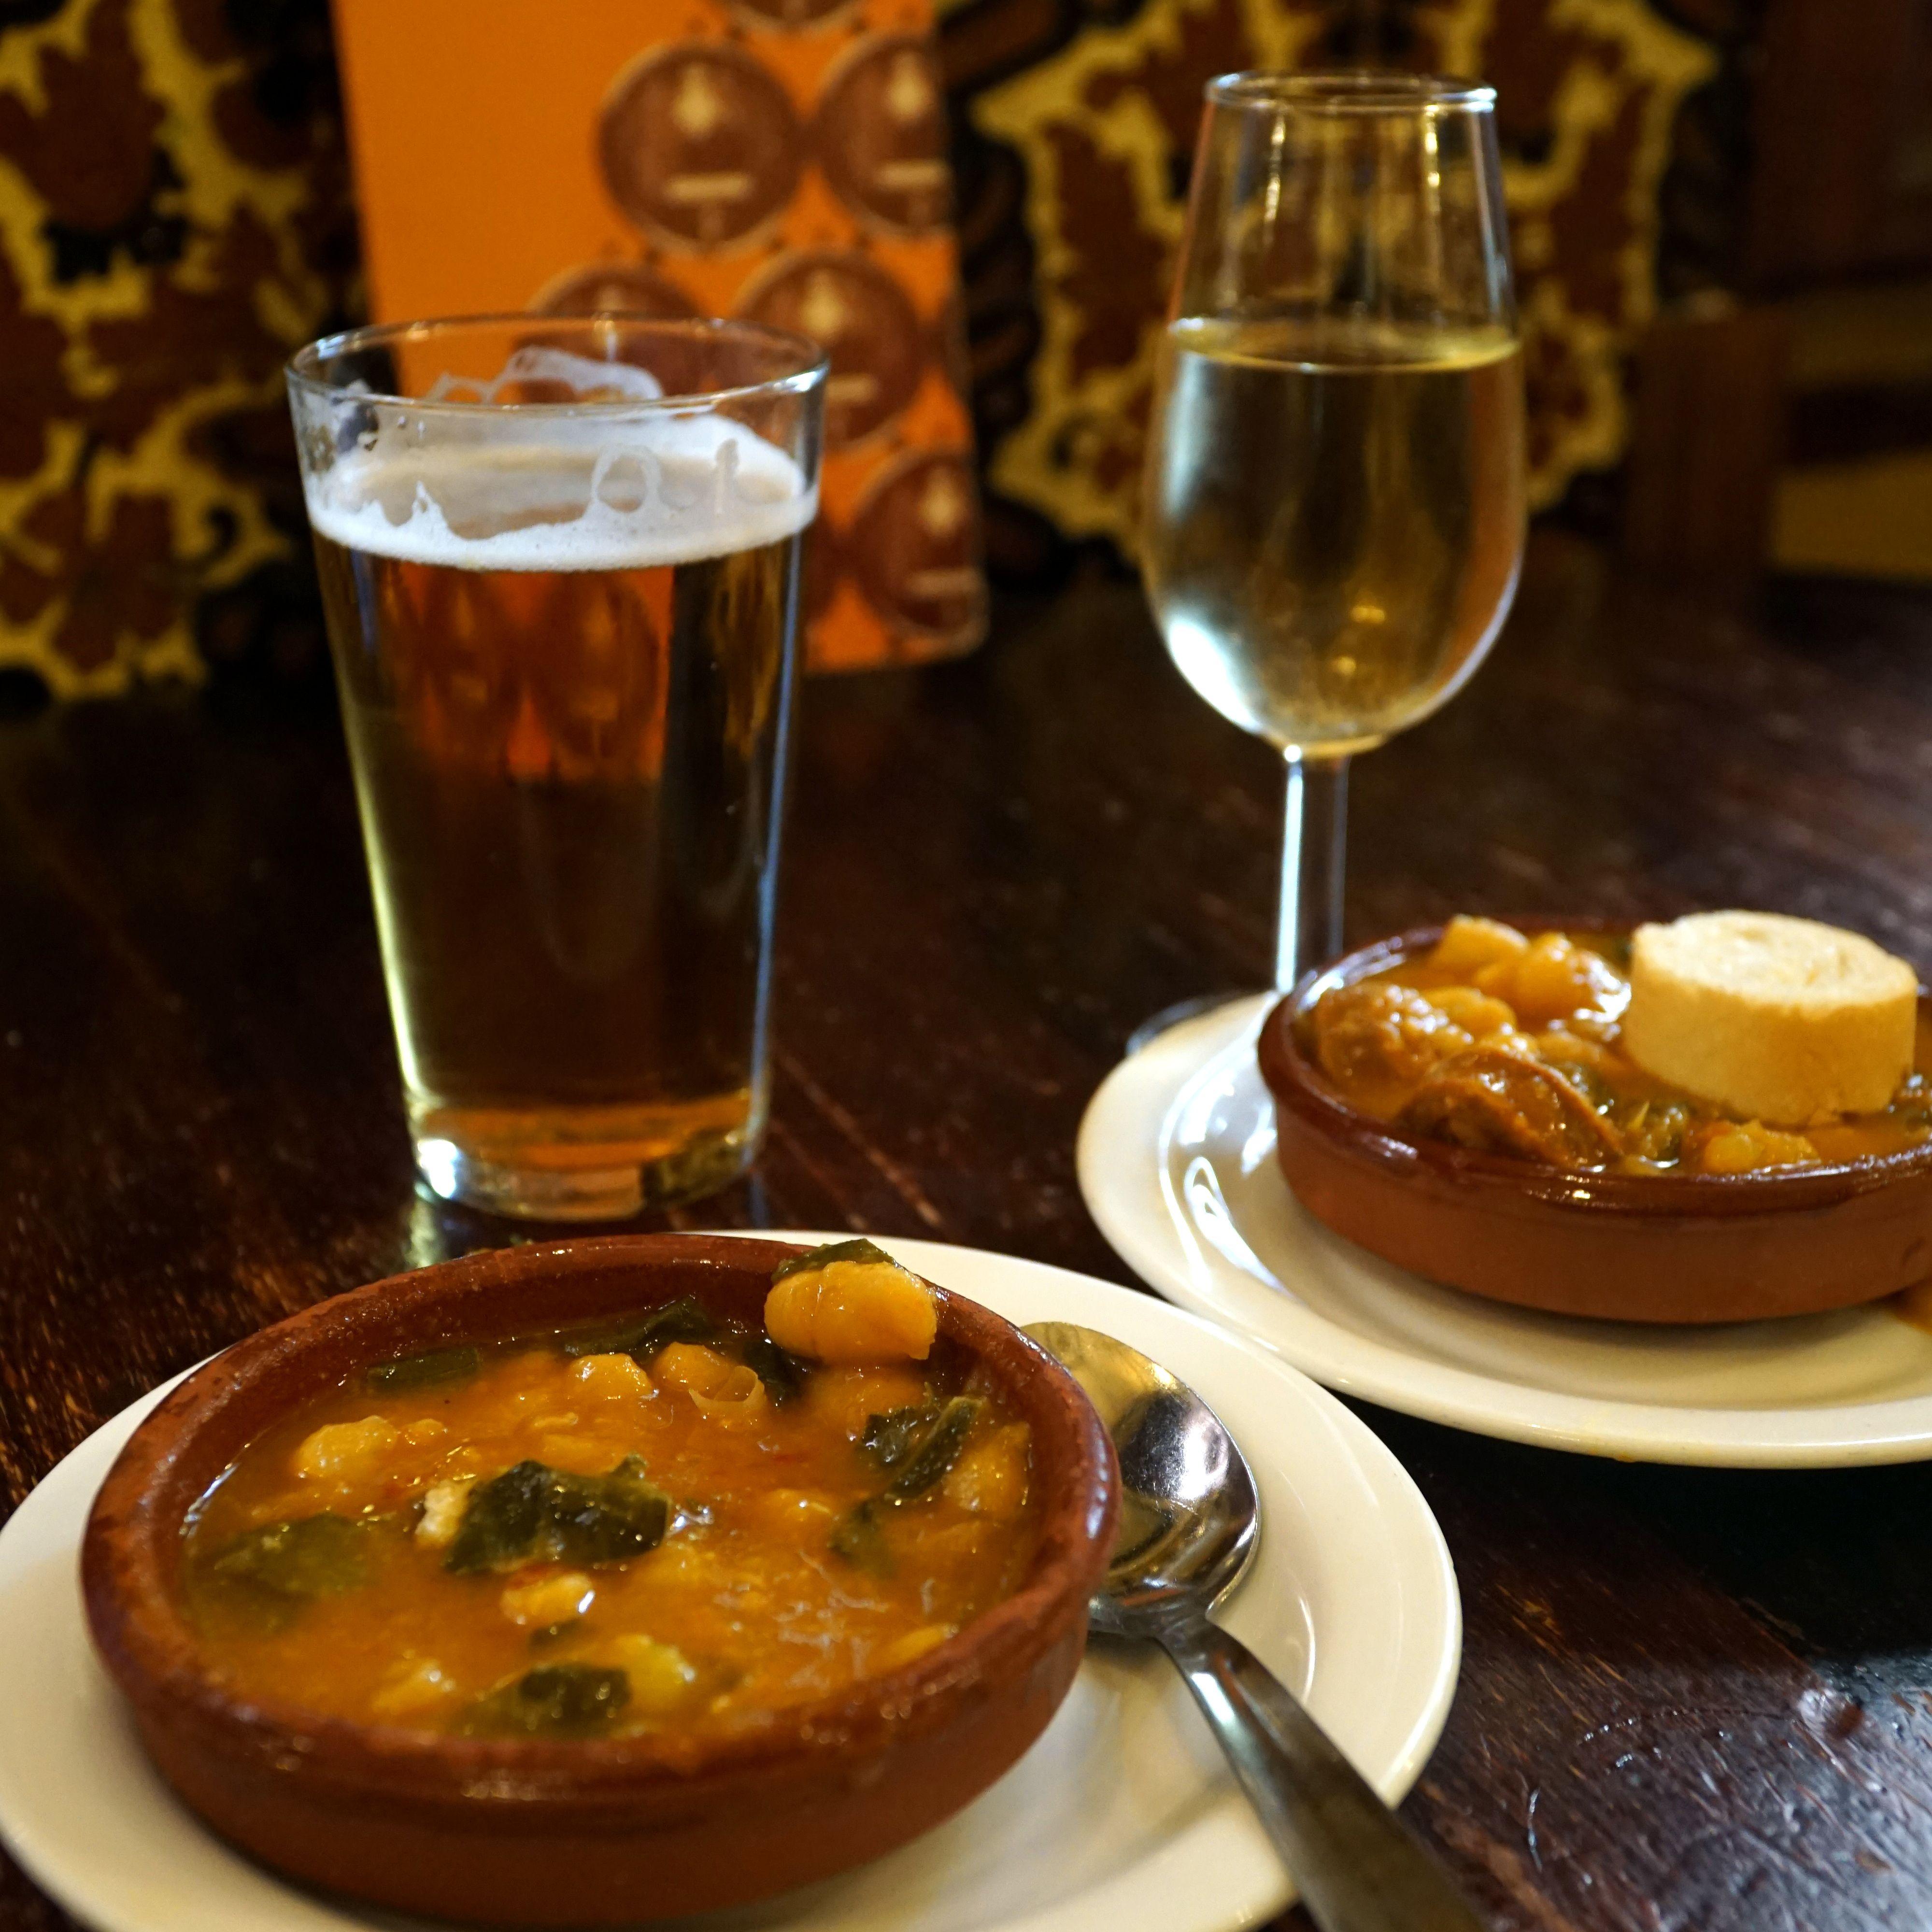 Bean stew at Bodegas Castañeda